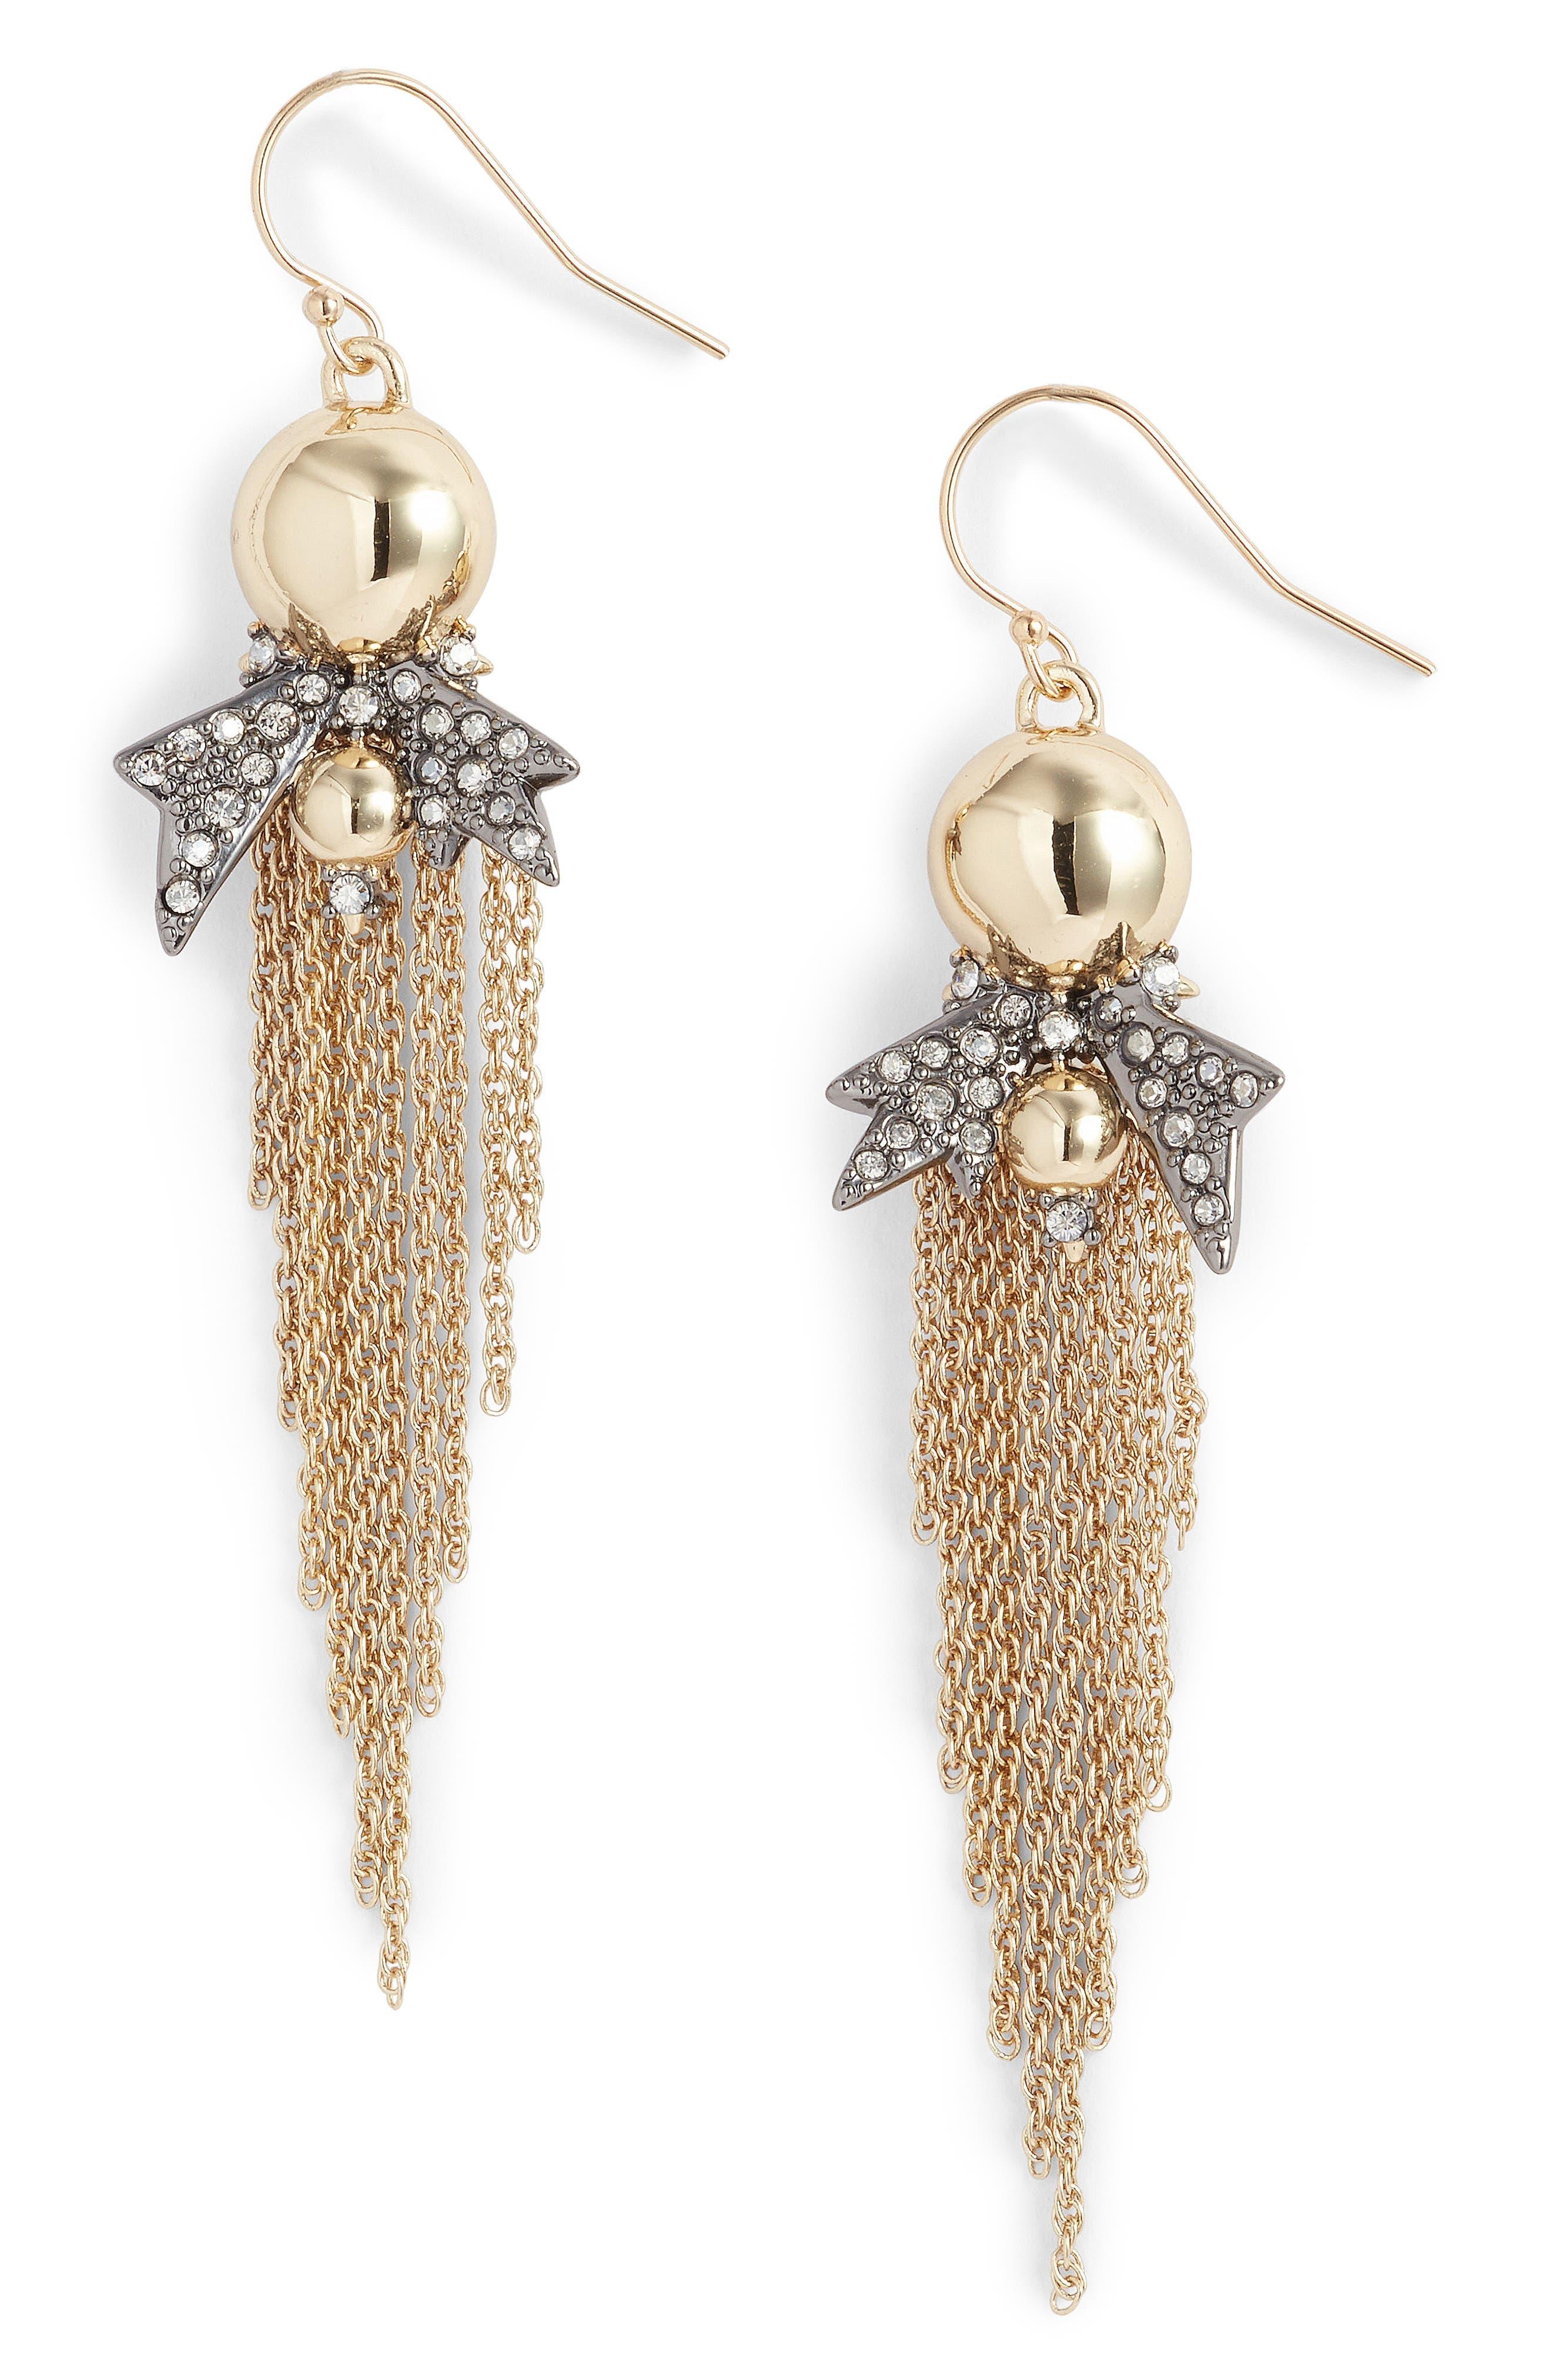 Gold Ball Drop Earrings,                             Main thumbnail 1, color,                             710